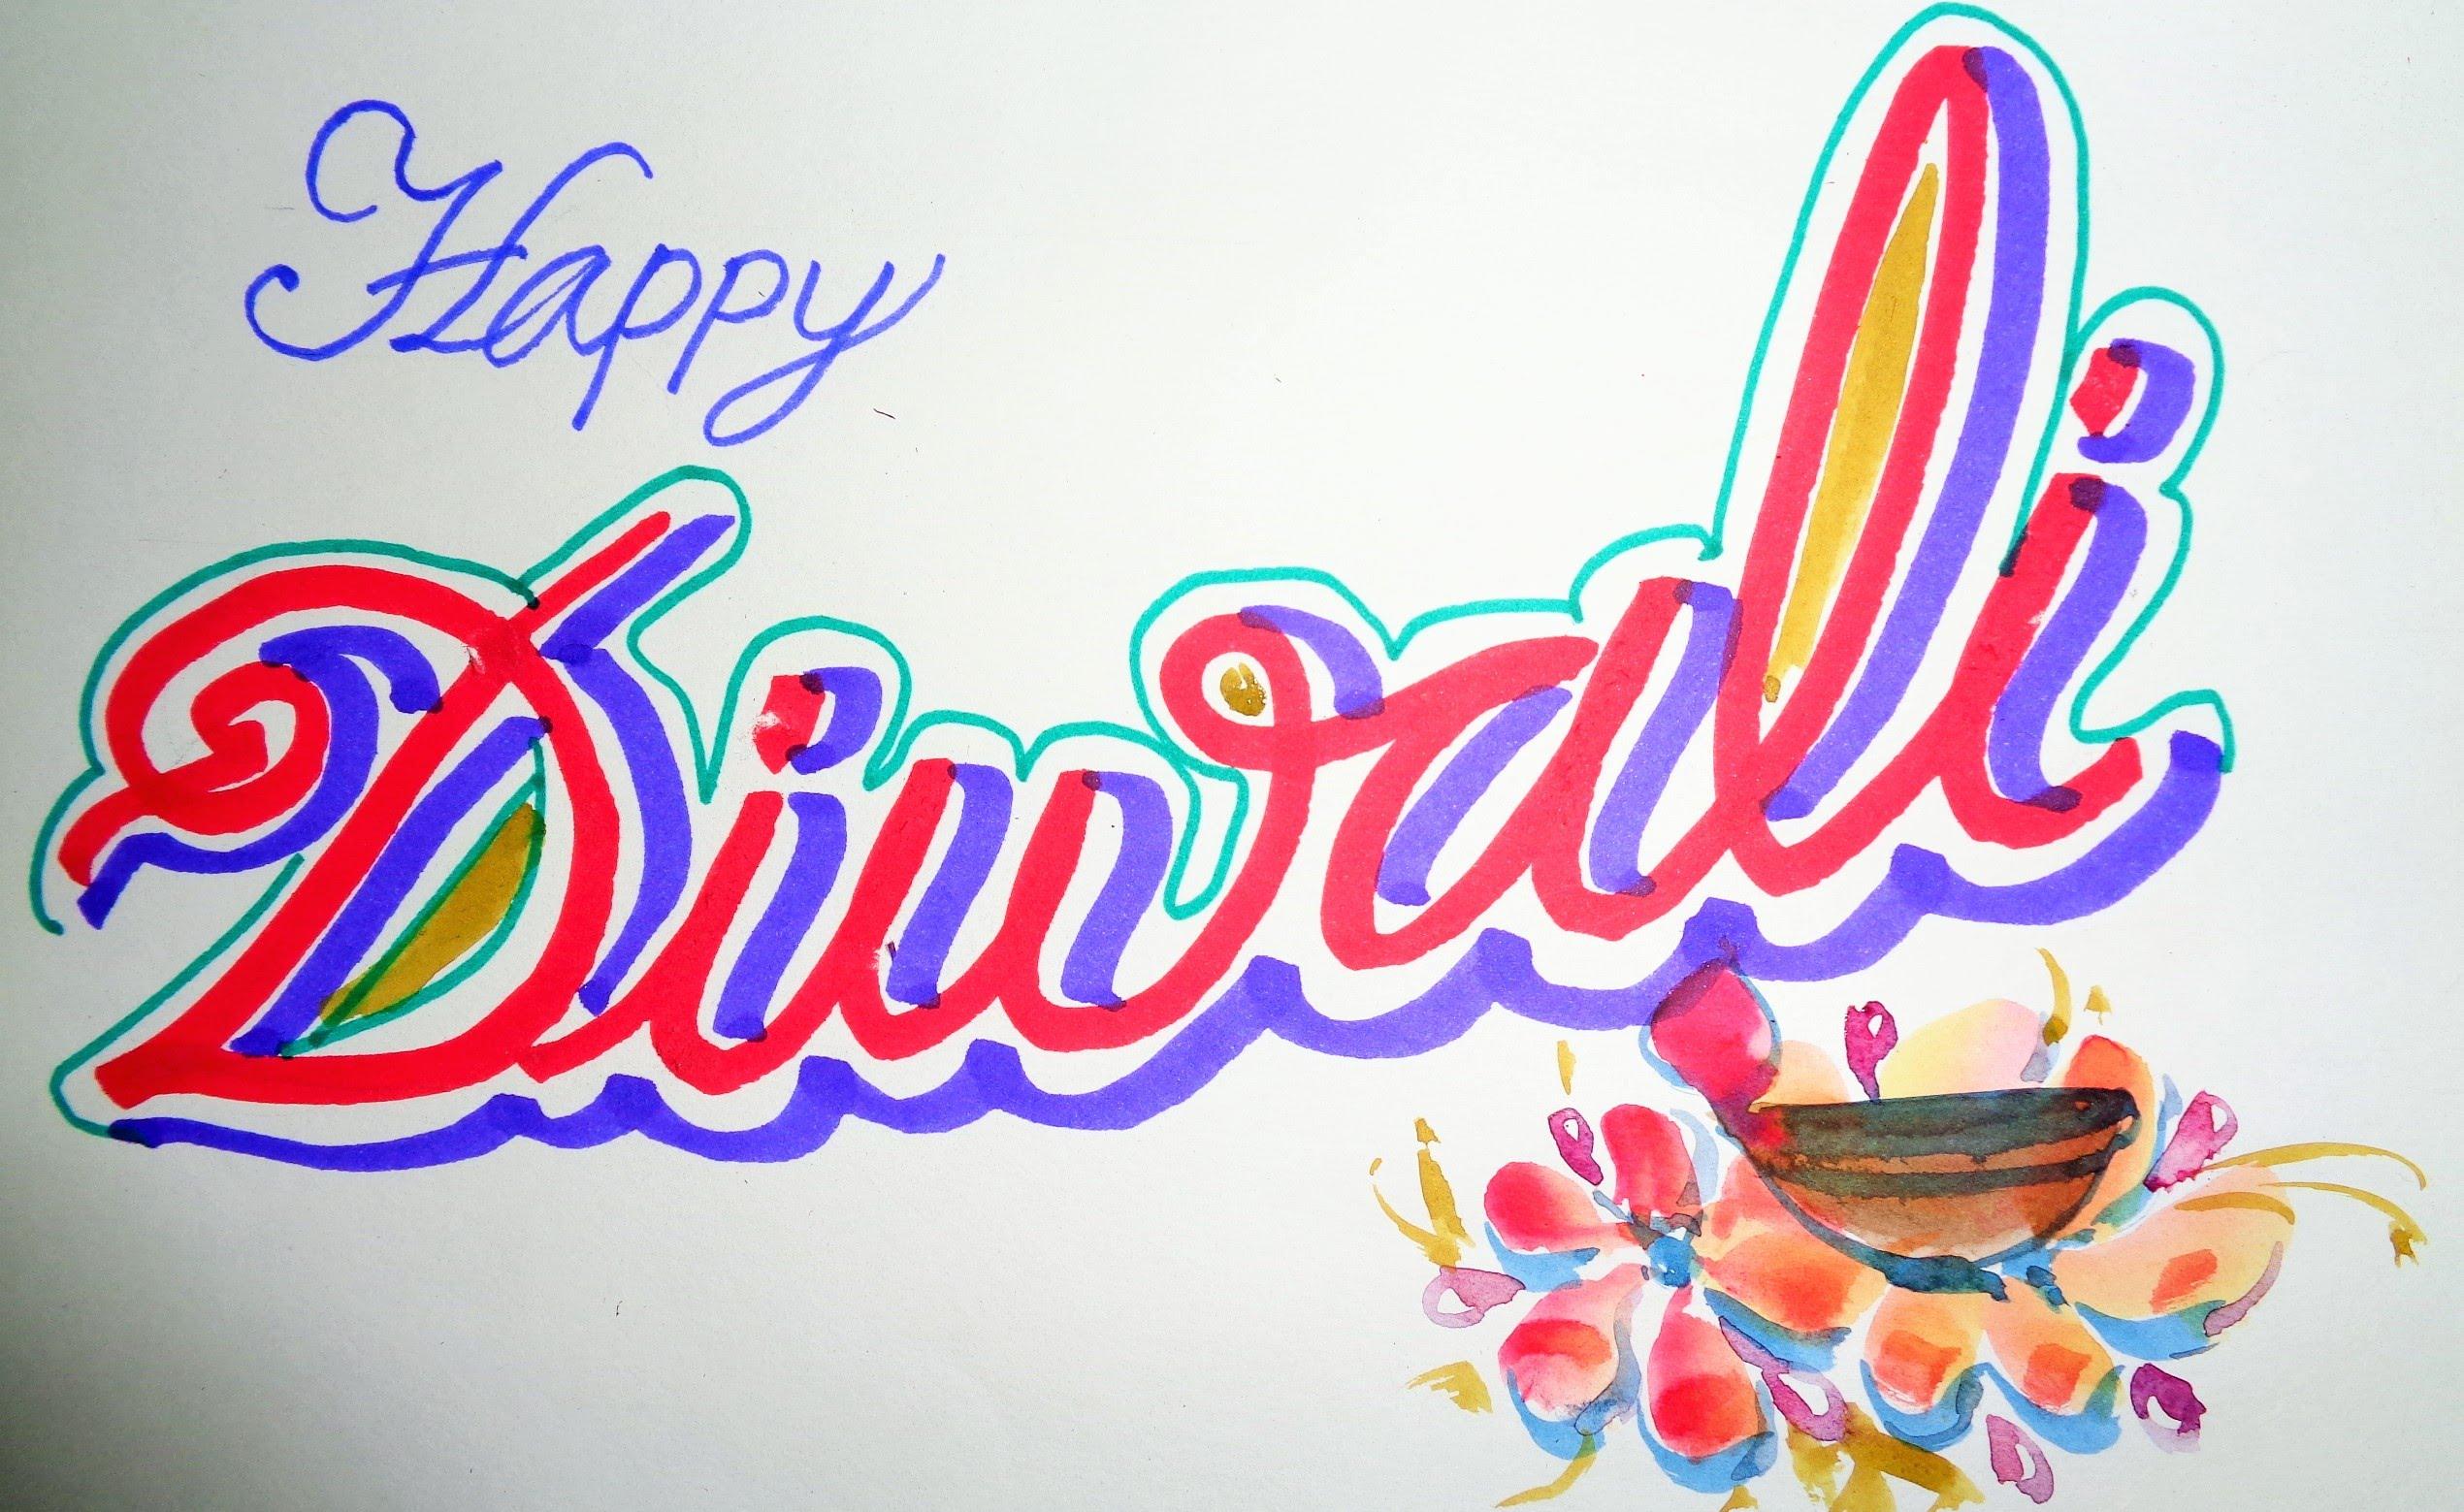 2540x1559 How To Make Happy Diwali